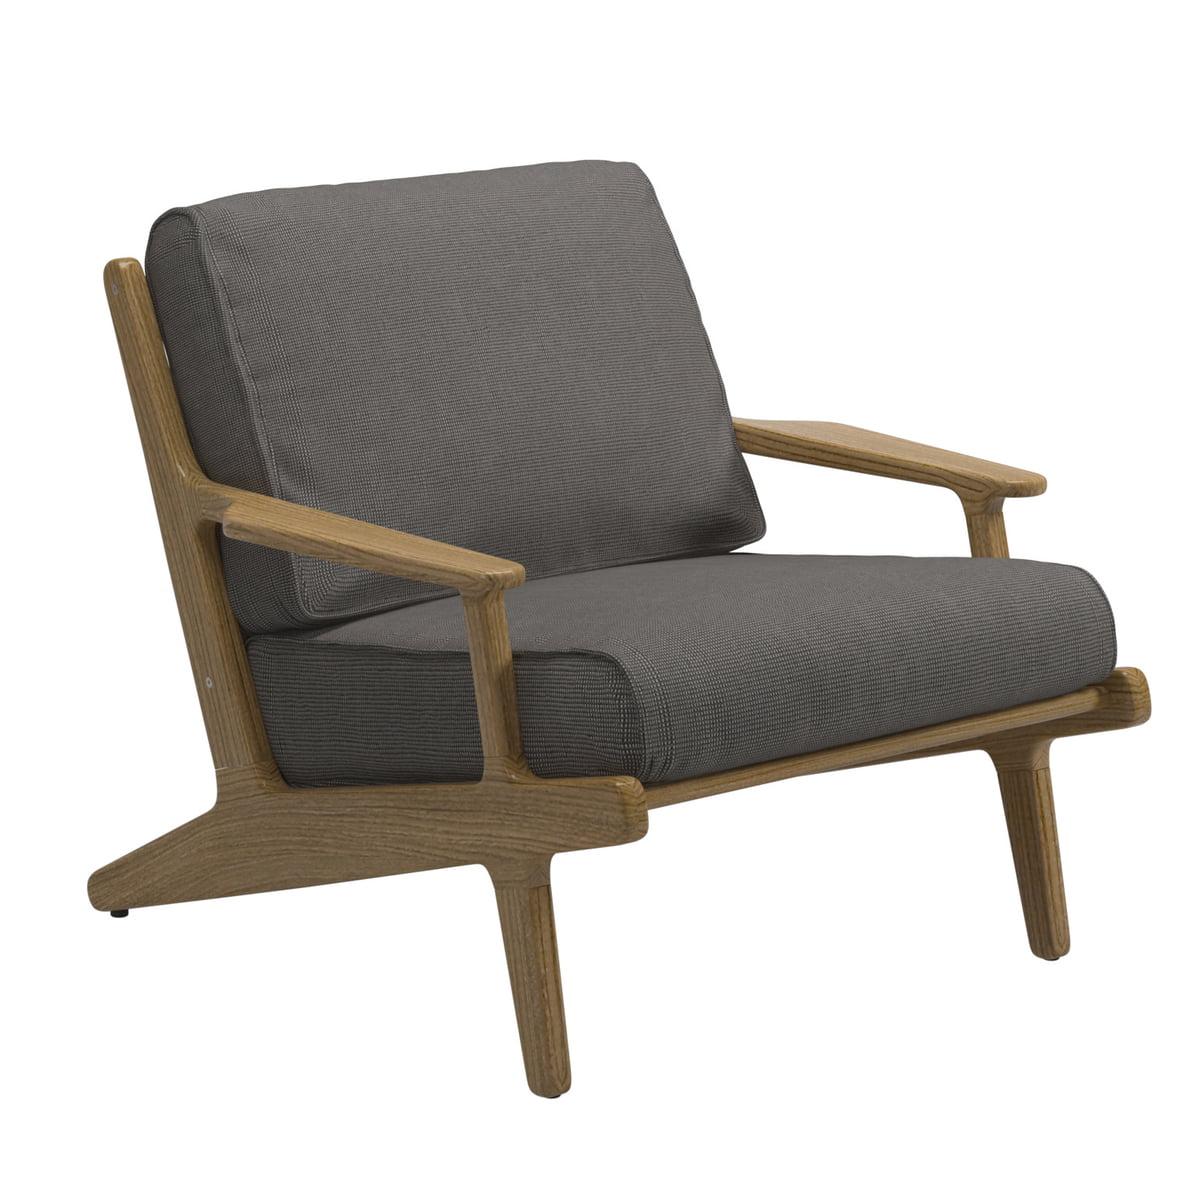 Gloster   Bay Lounge Chair, Teak Frame / Gran Sunbrella Cover